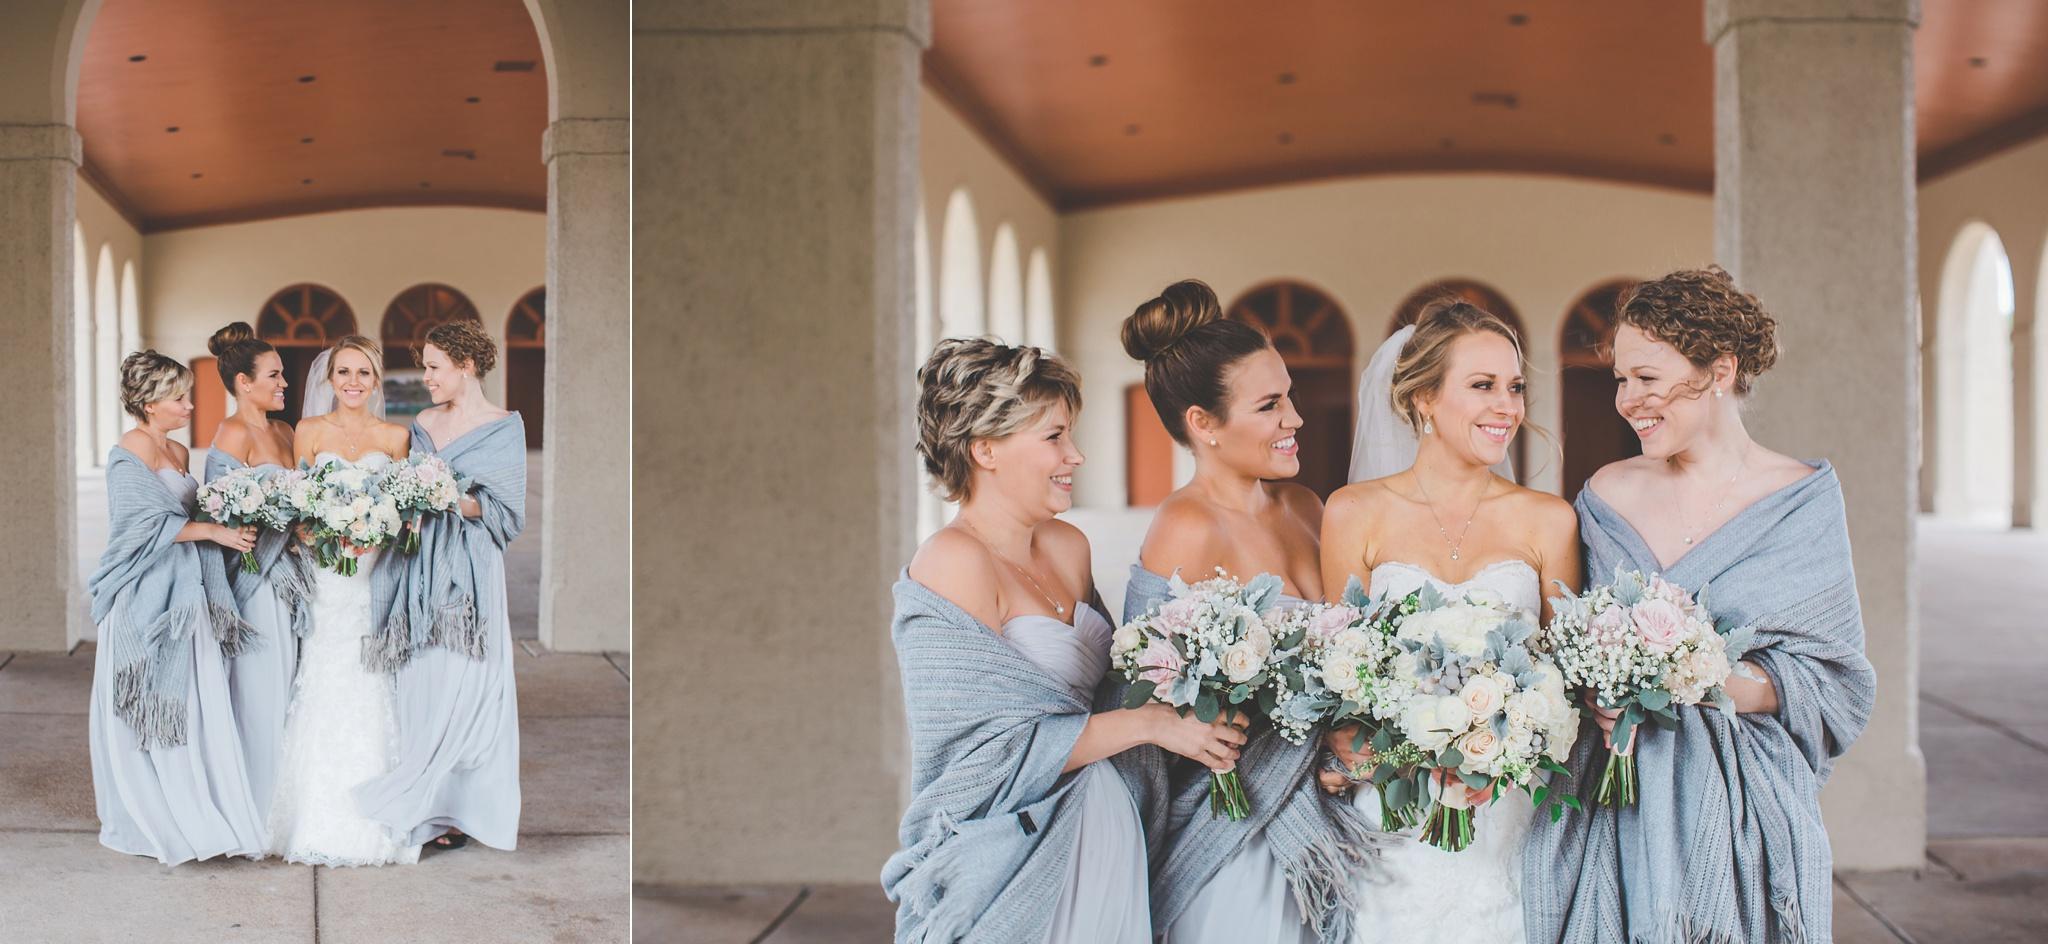 St. Louis Wedding Photographer   Chandler Rose Photography_0030.jpg